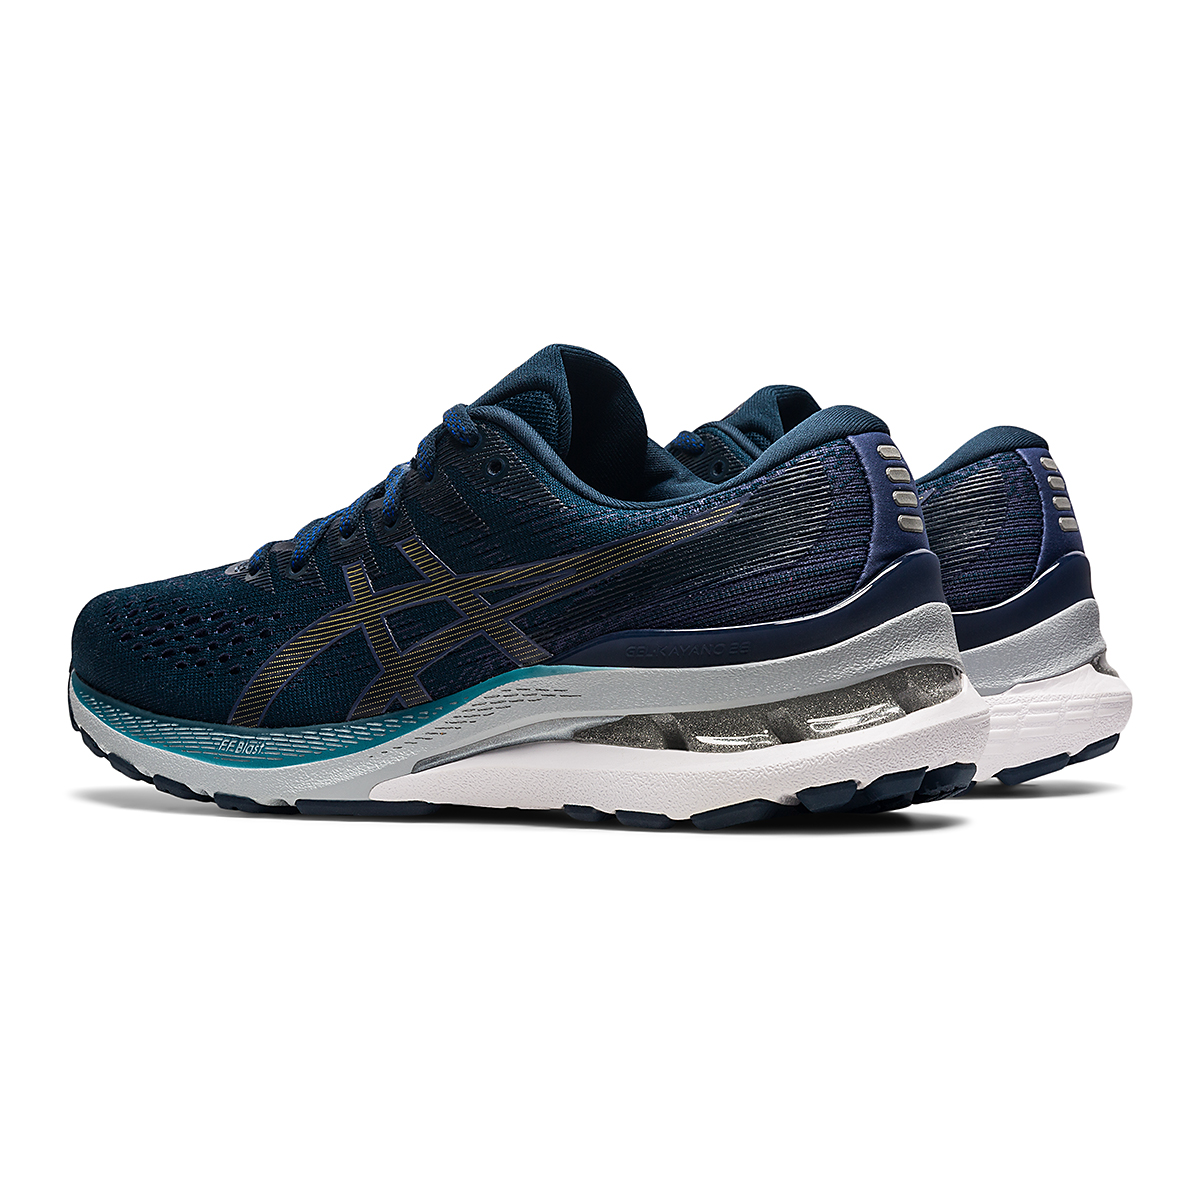 Women's Asics Gel-Kayano 28 Running Shoe - Color: French Blue/Thunder Blue - Size: 5 - Width: Wide, French Blue/Thunder Blue, large, image 4